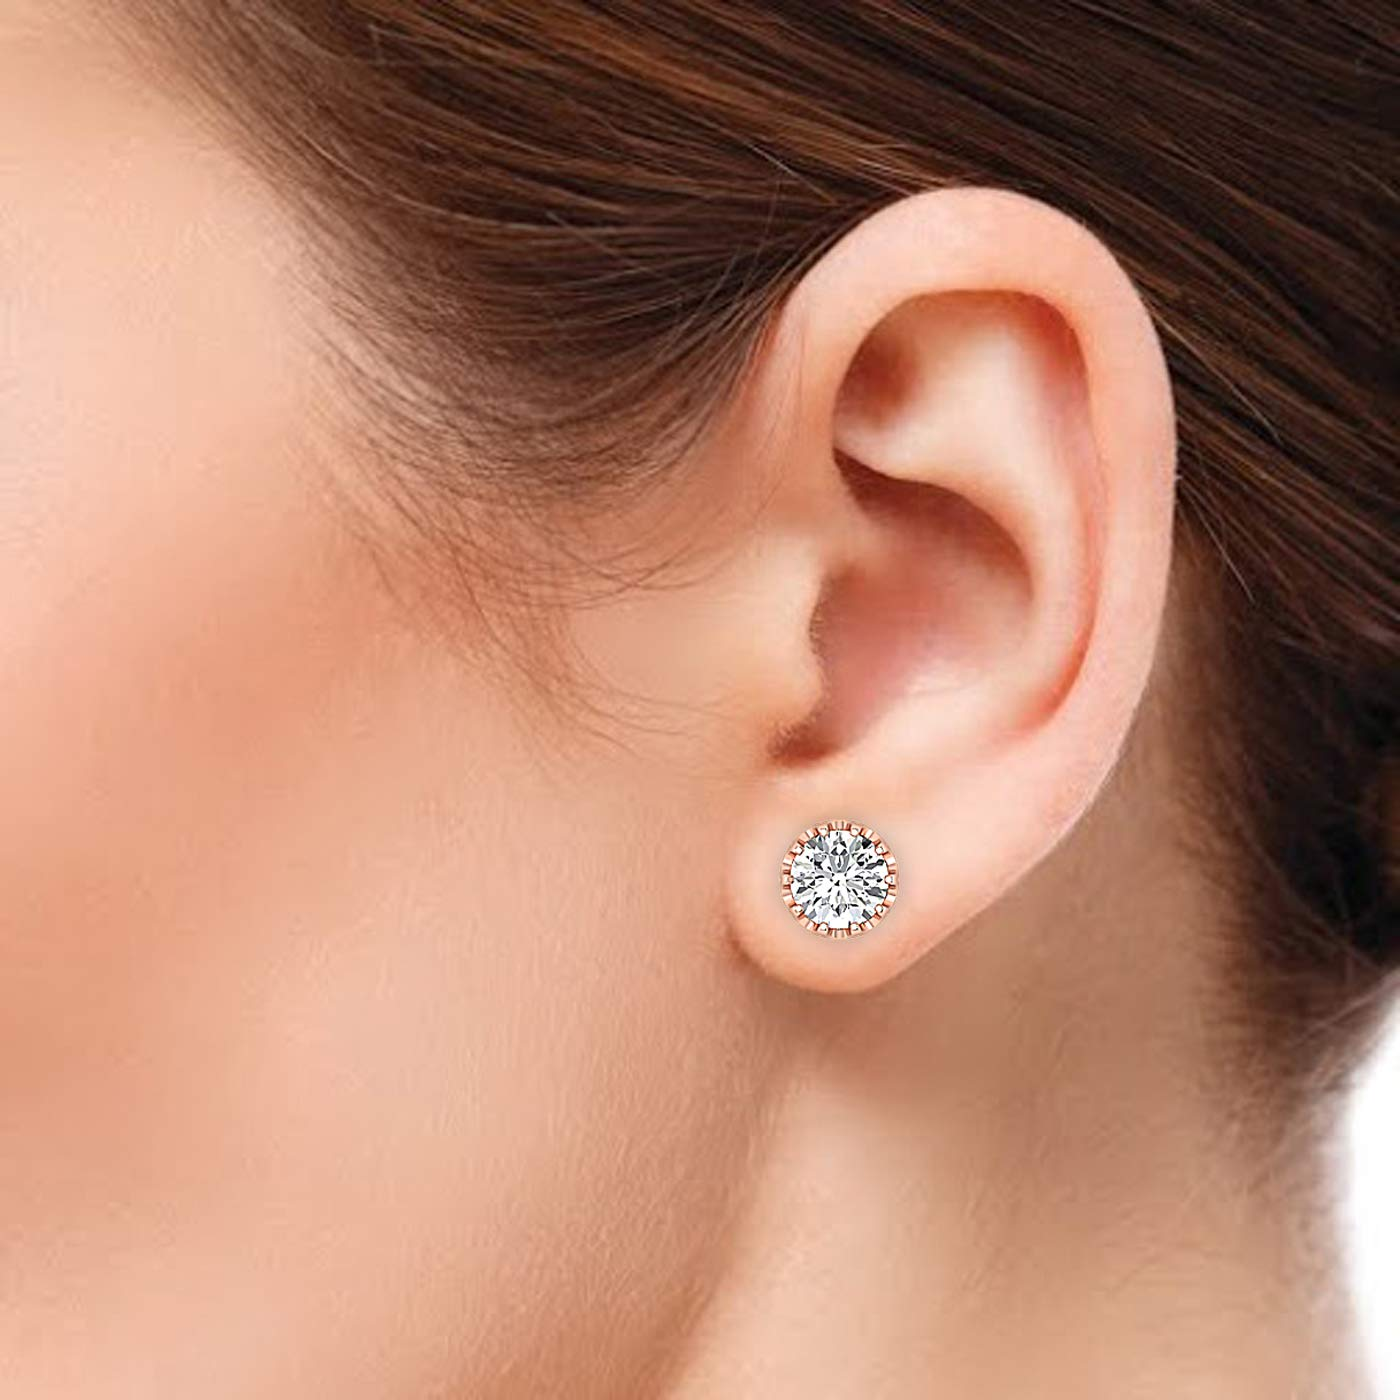 18K rose-gold GH//VVS Earring Studs 0.3 to 4 Carat Moissanite Stud Earrings Round Brilliant Stud Earrings for Women perfect Jewelry Gifts for Women Teen Girls